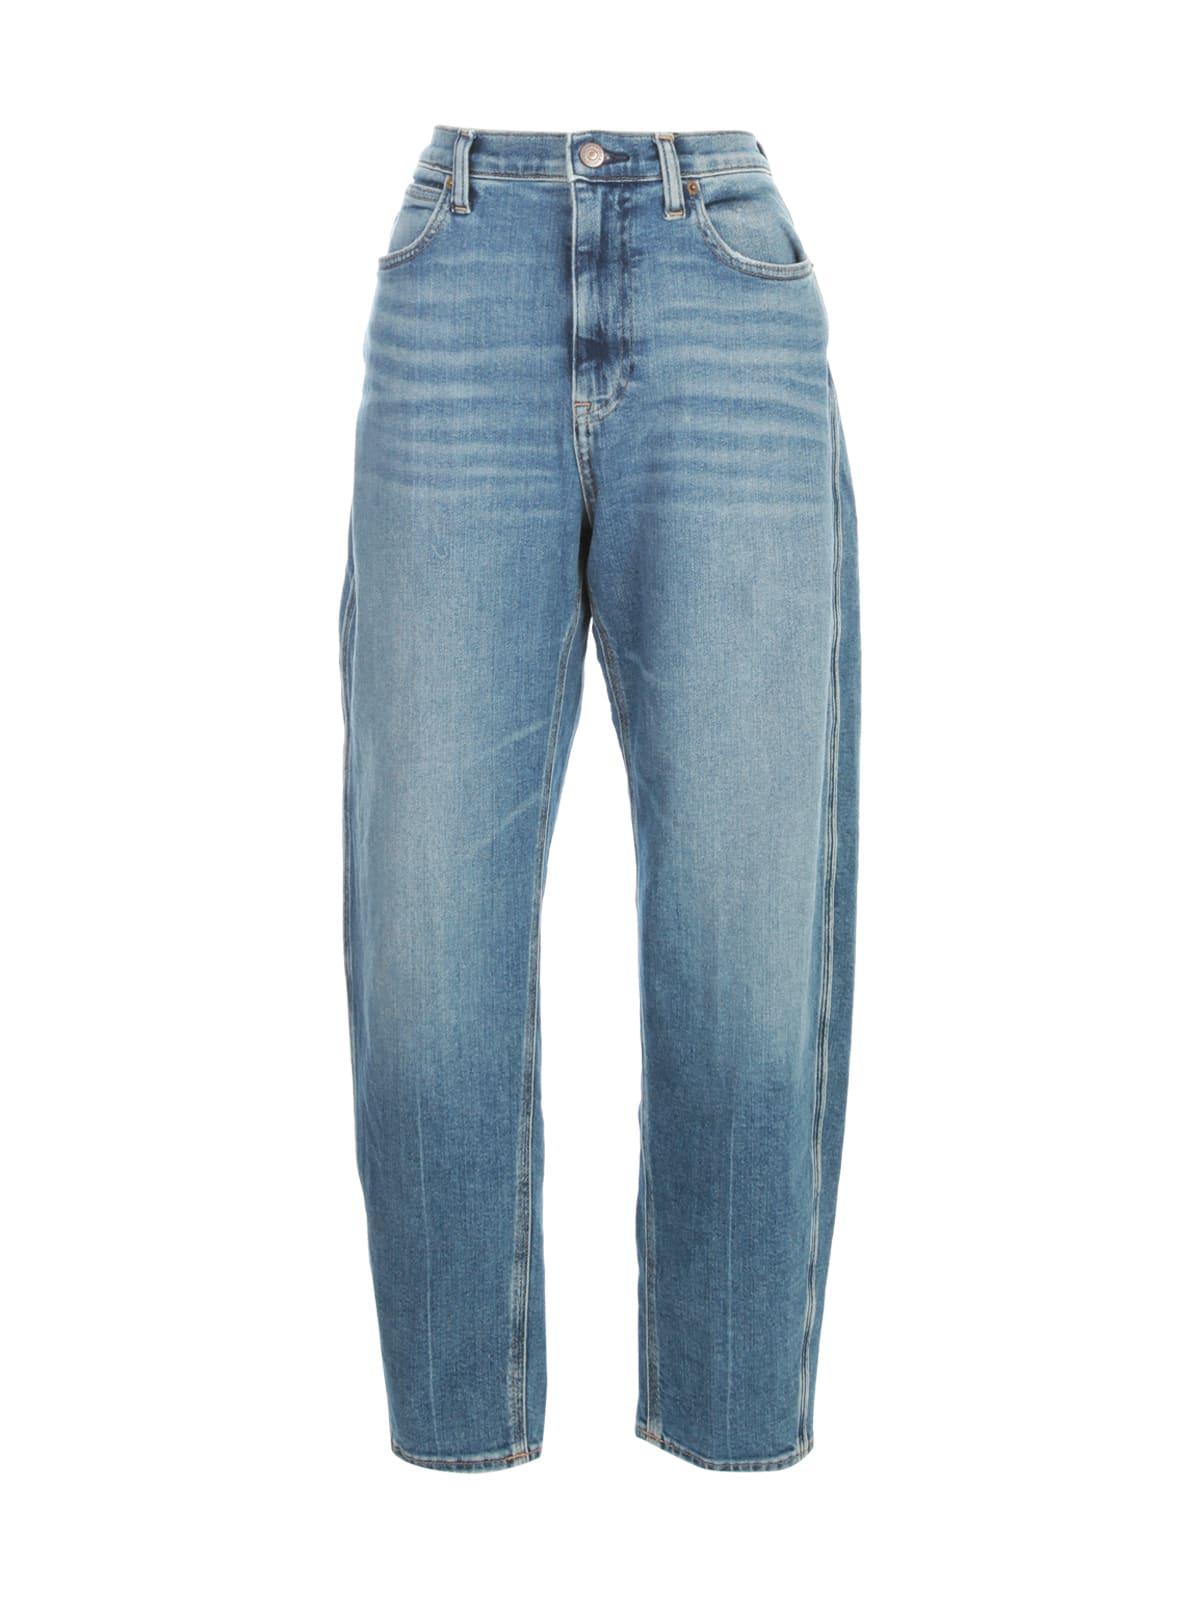 Polo Ralph Lauren High Waisted Jeans In Medium Indigo